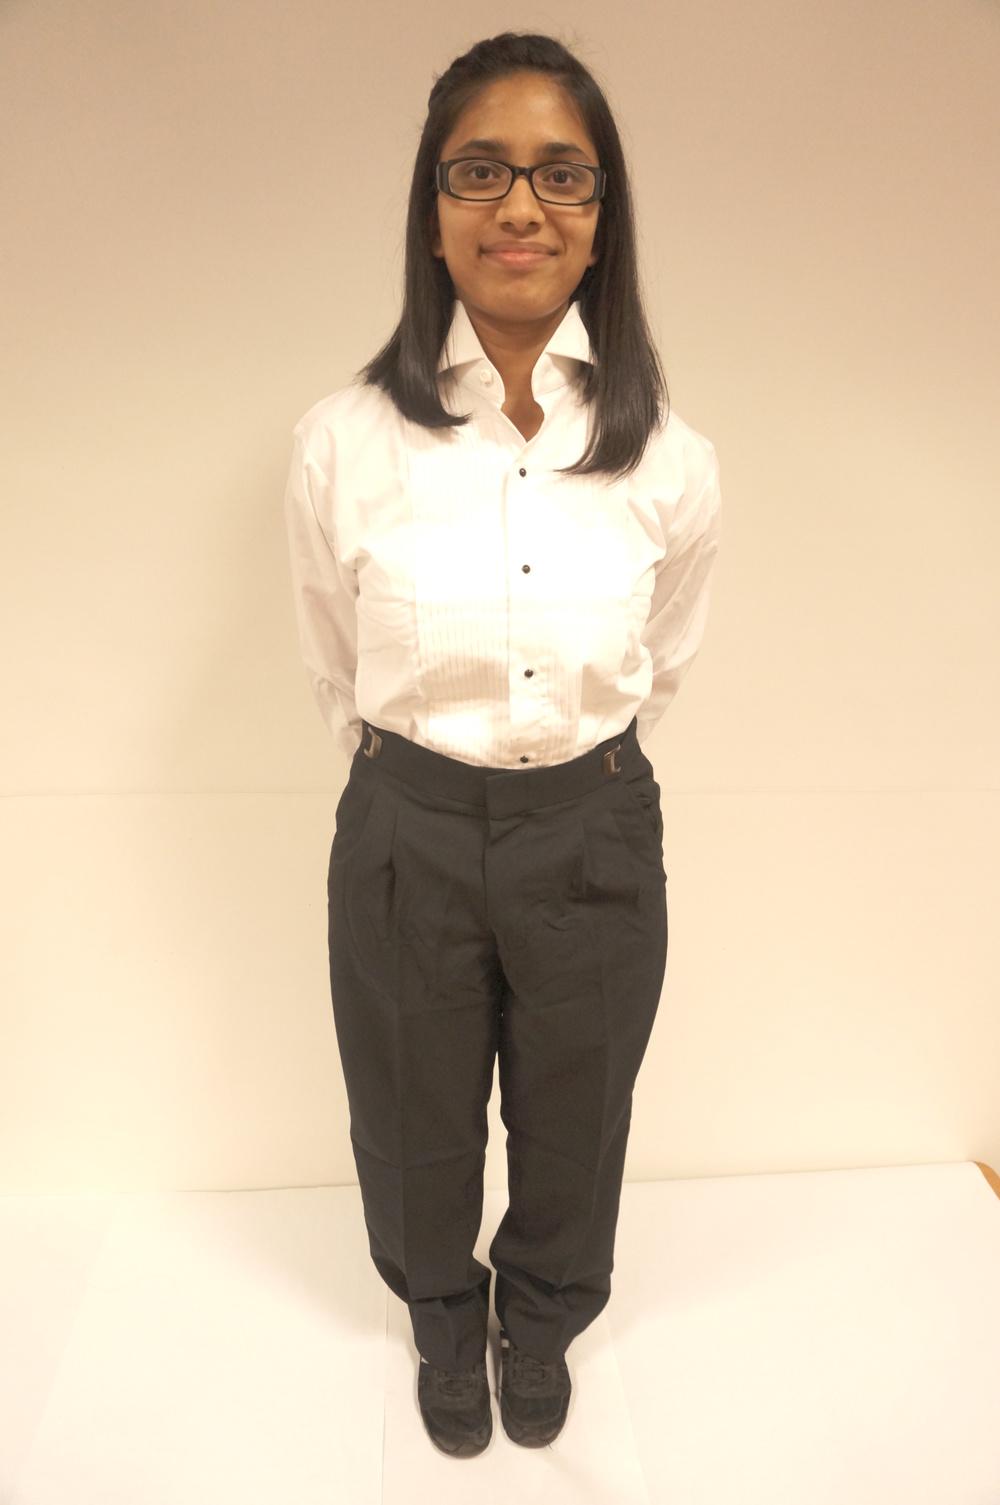 White Shirt And Black Pants - White Pants 2016